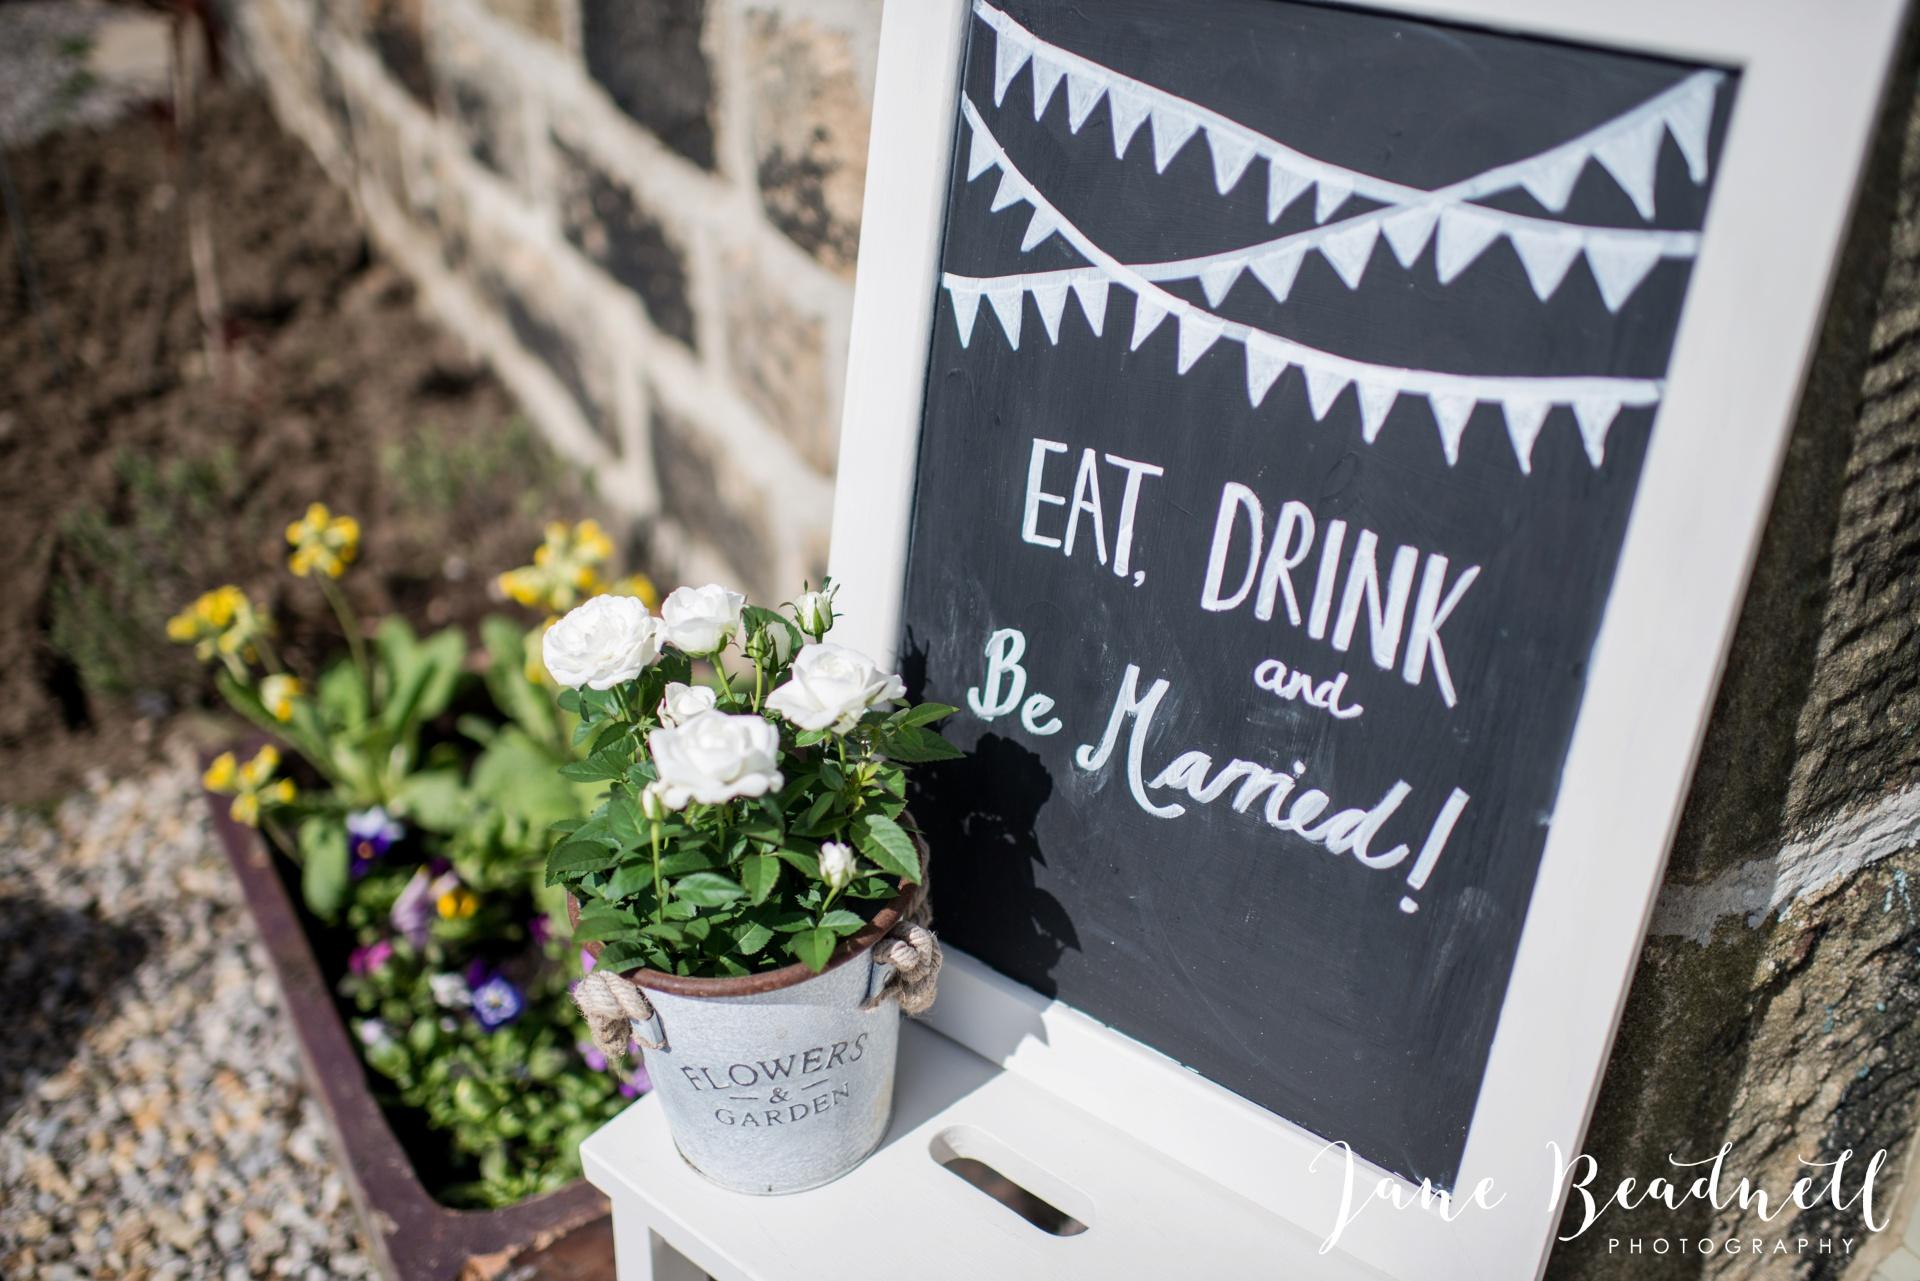 Jane Beadnell fine art wedding photographer The Cheerful Chilli Barn Otley_0010